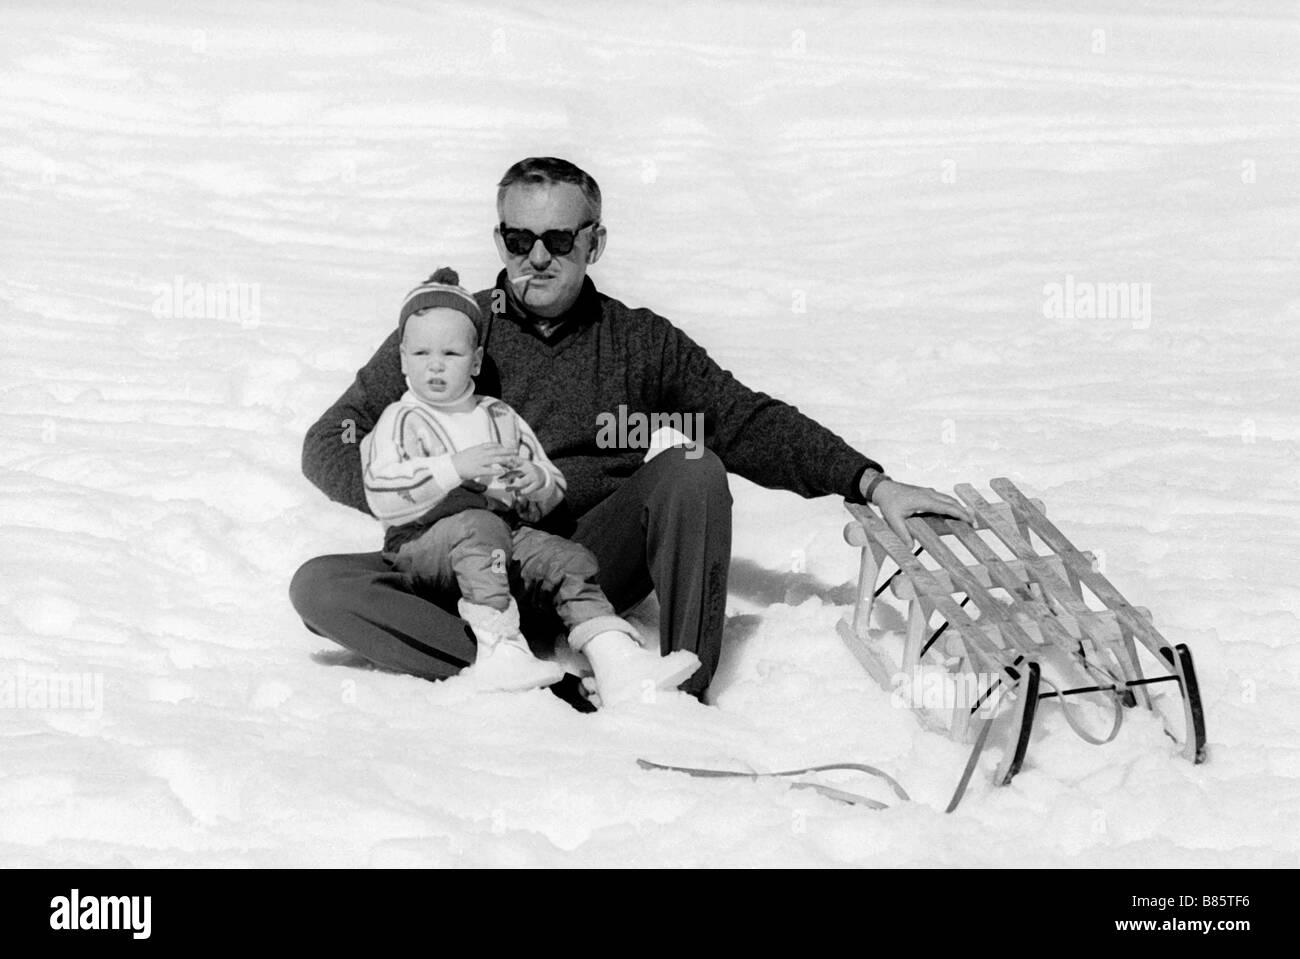 Rainier III and Albert of Monaco in Gstaad (1961) - Stock Image